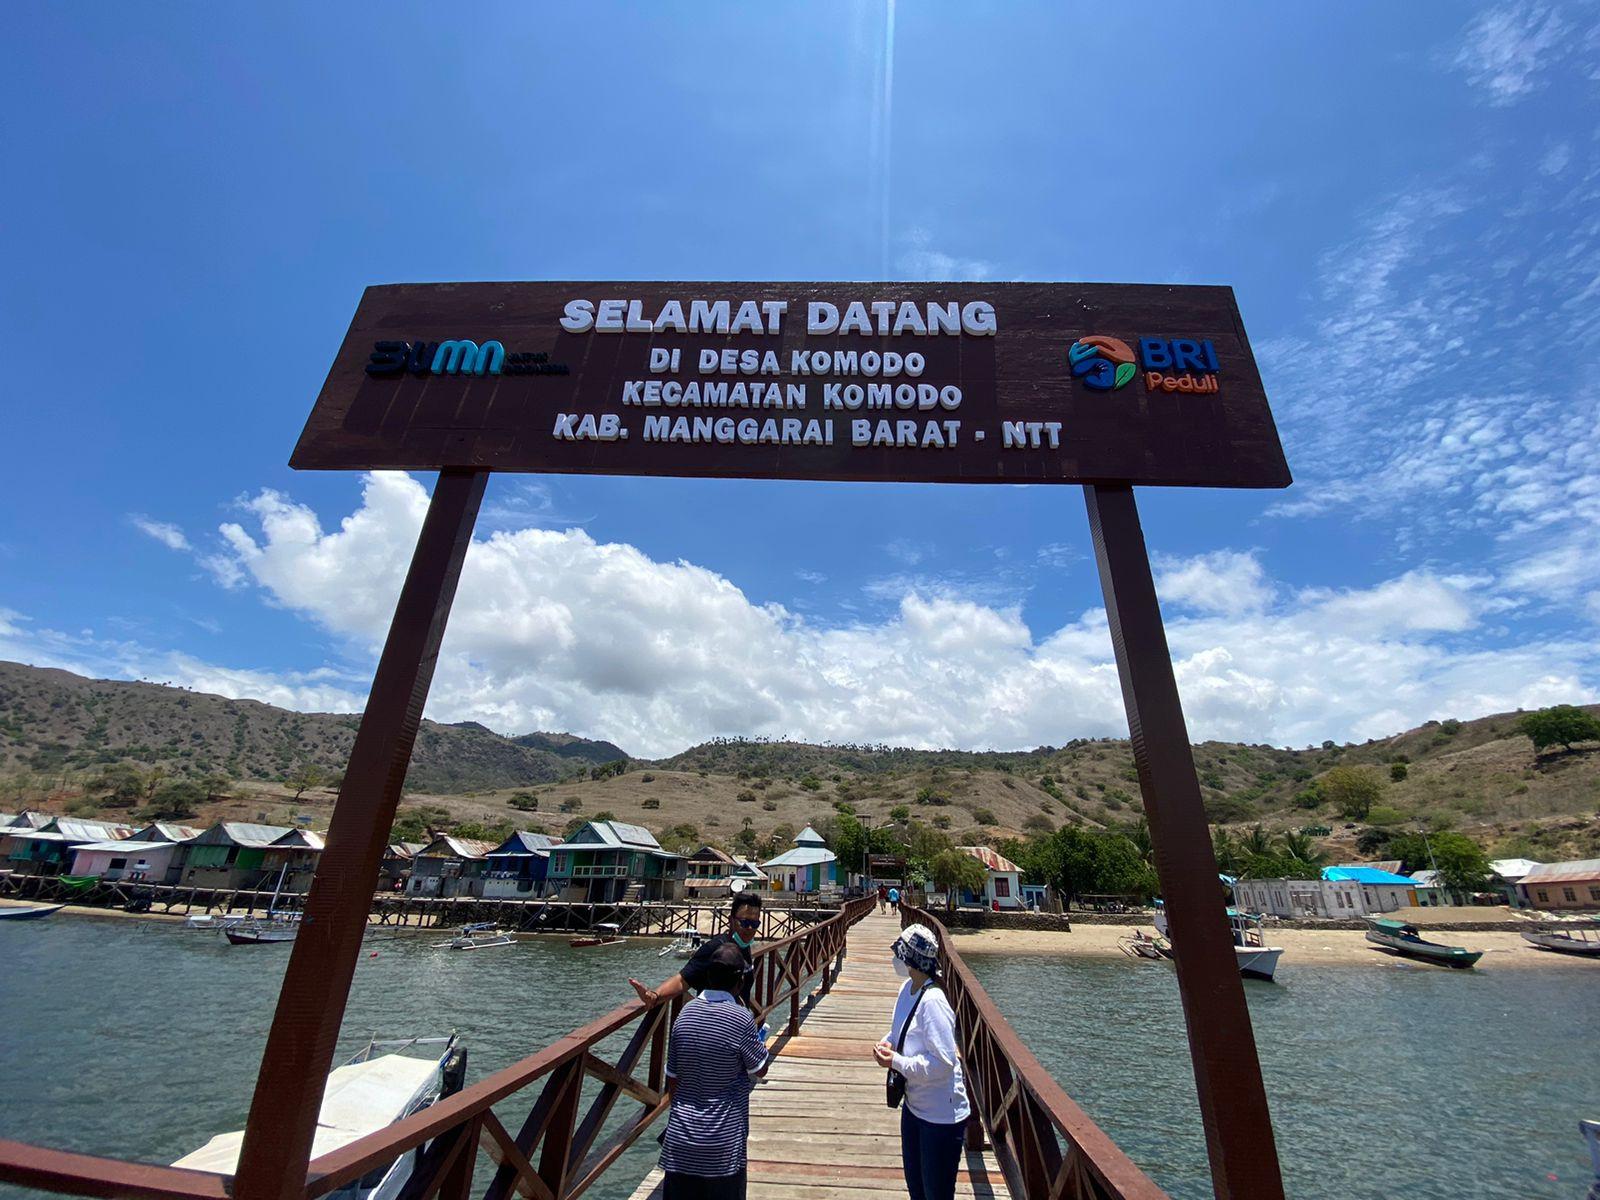 BRI Peduli Mendongkrak Ekonomi Pulau Komodo via Bantuan Infrastruktur Pariwisata - JPNN.com